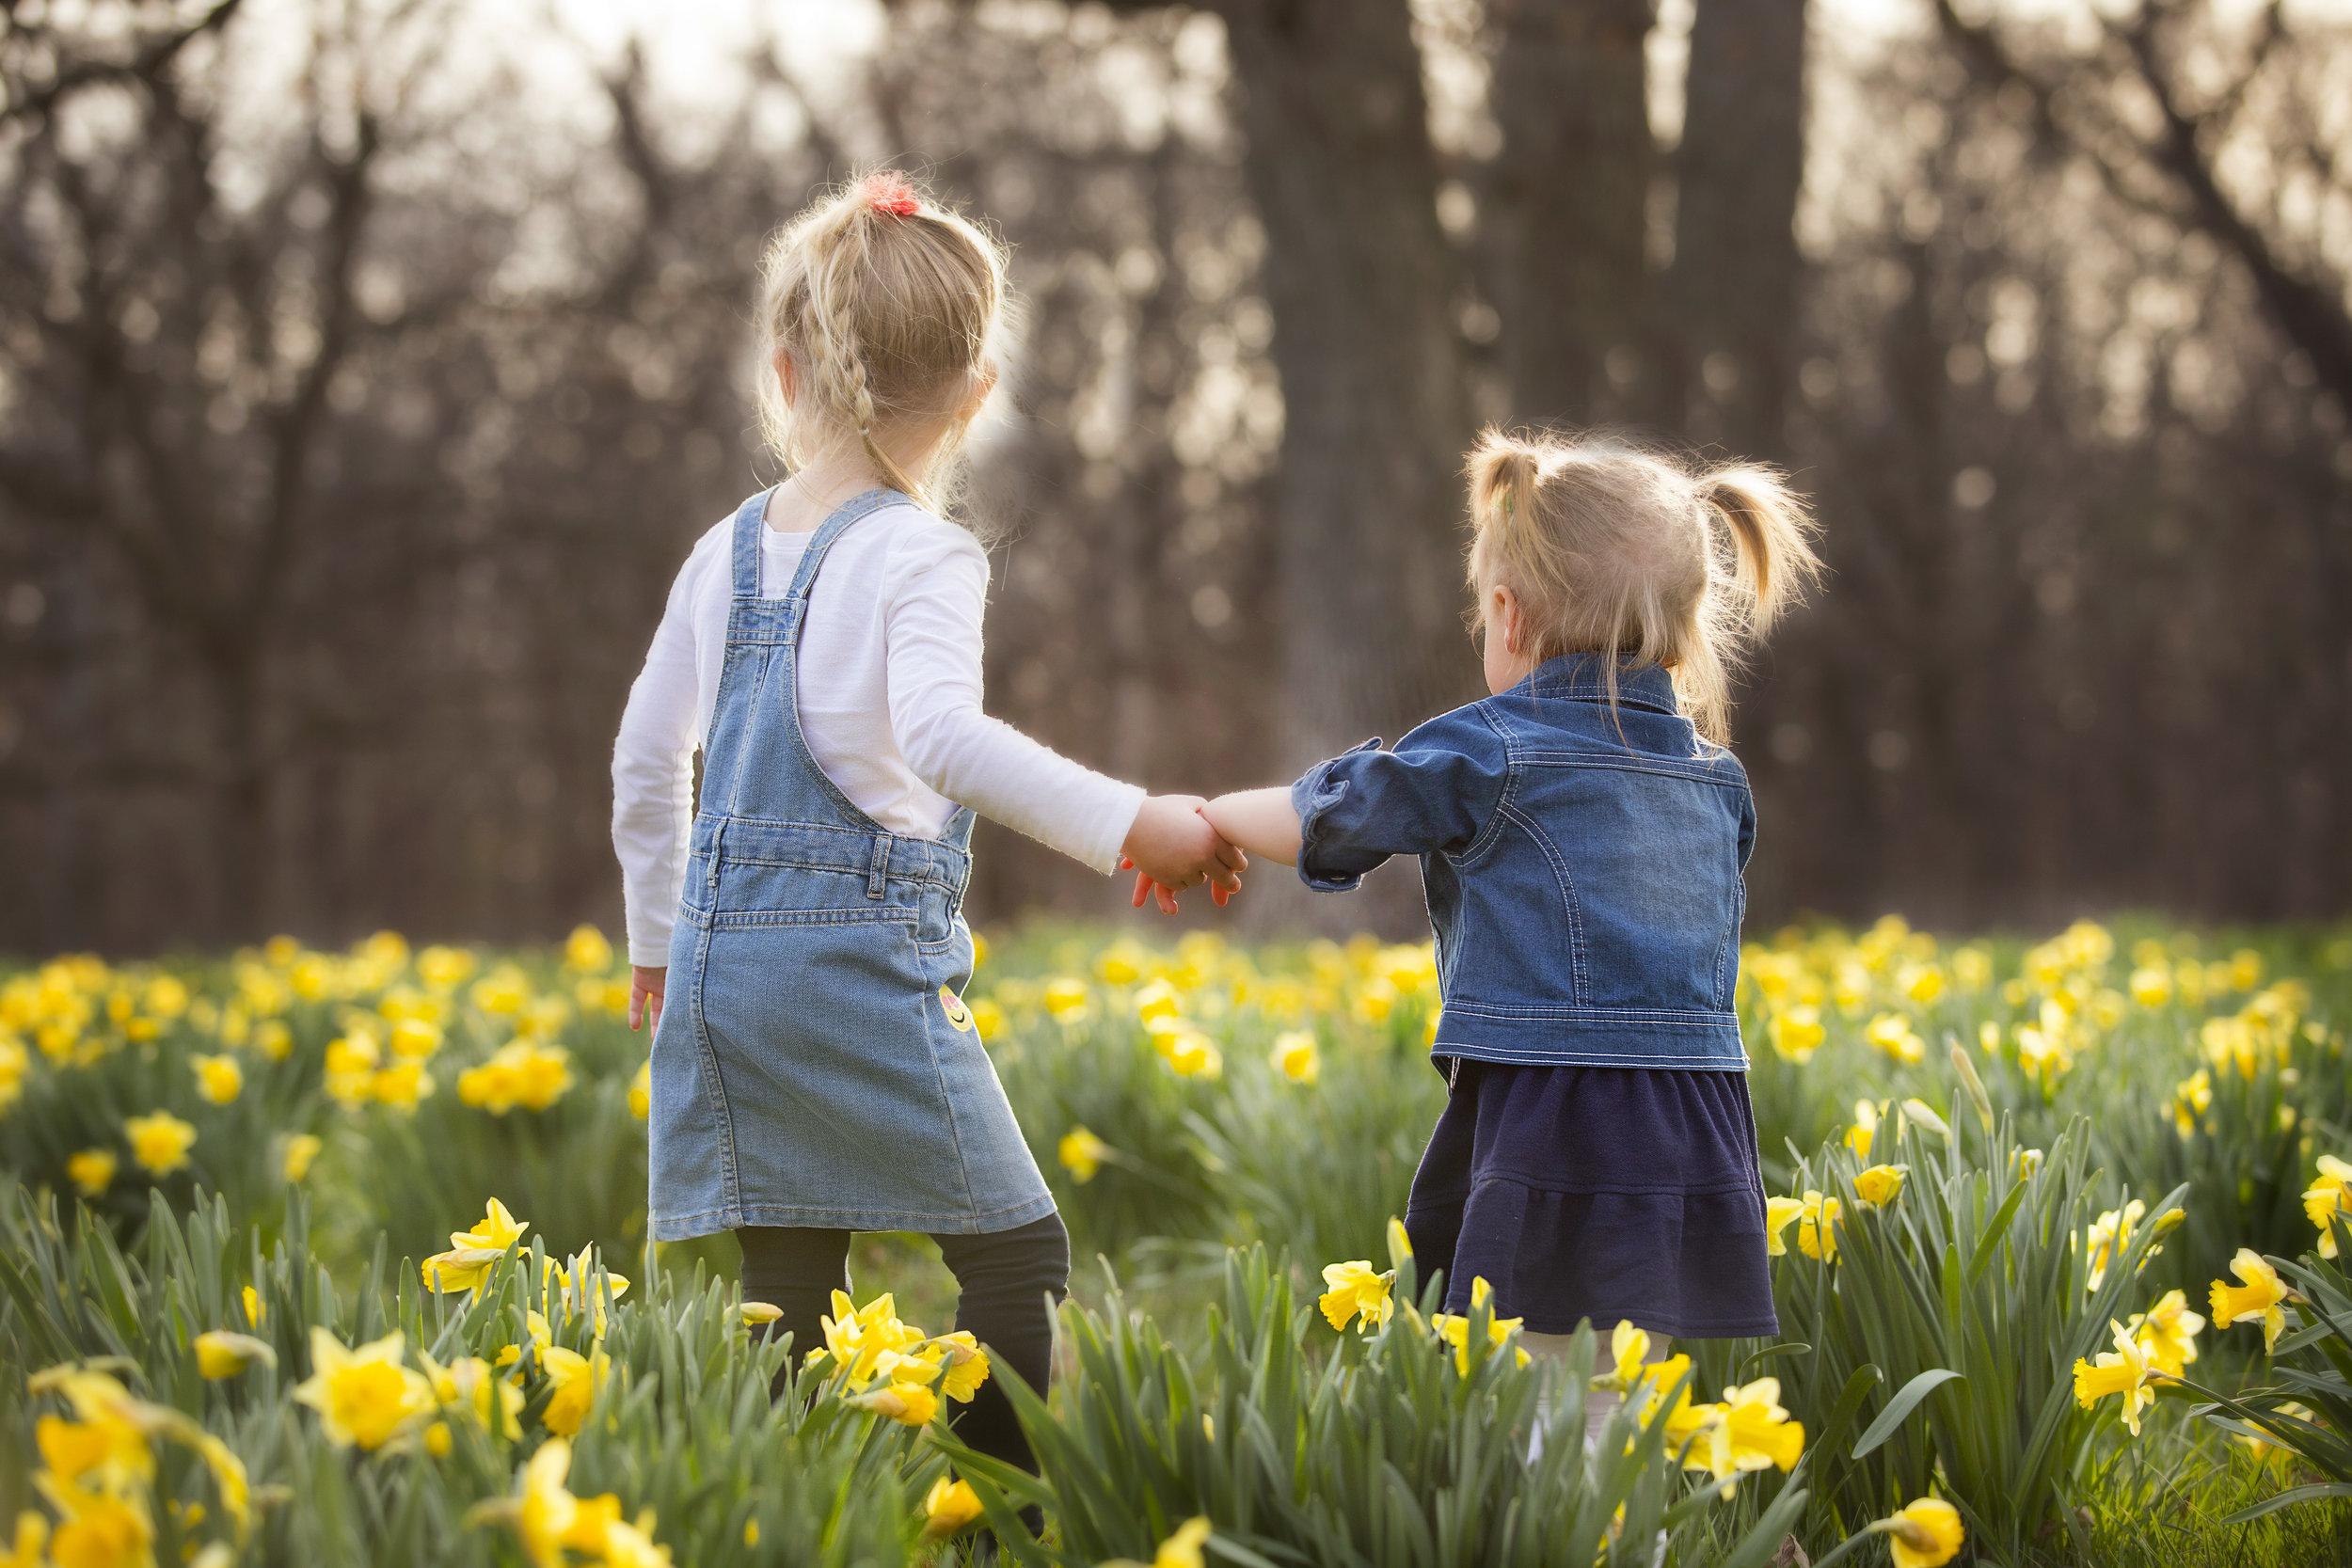 Rosiere_Daffodils_April 2018_IMG_3430.jpg